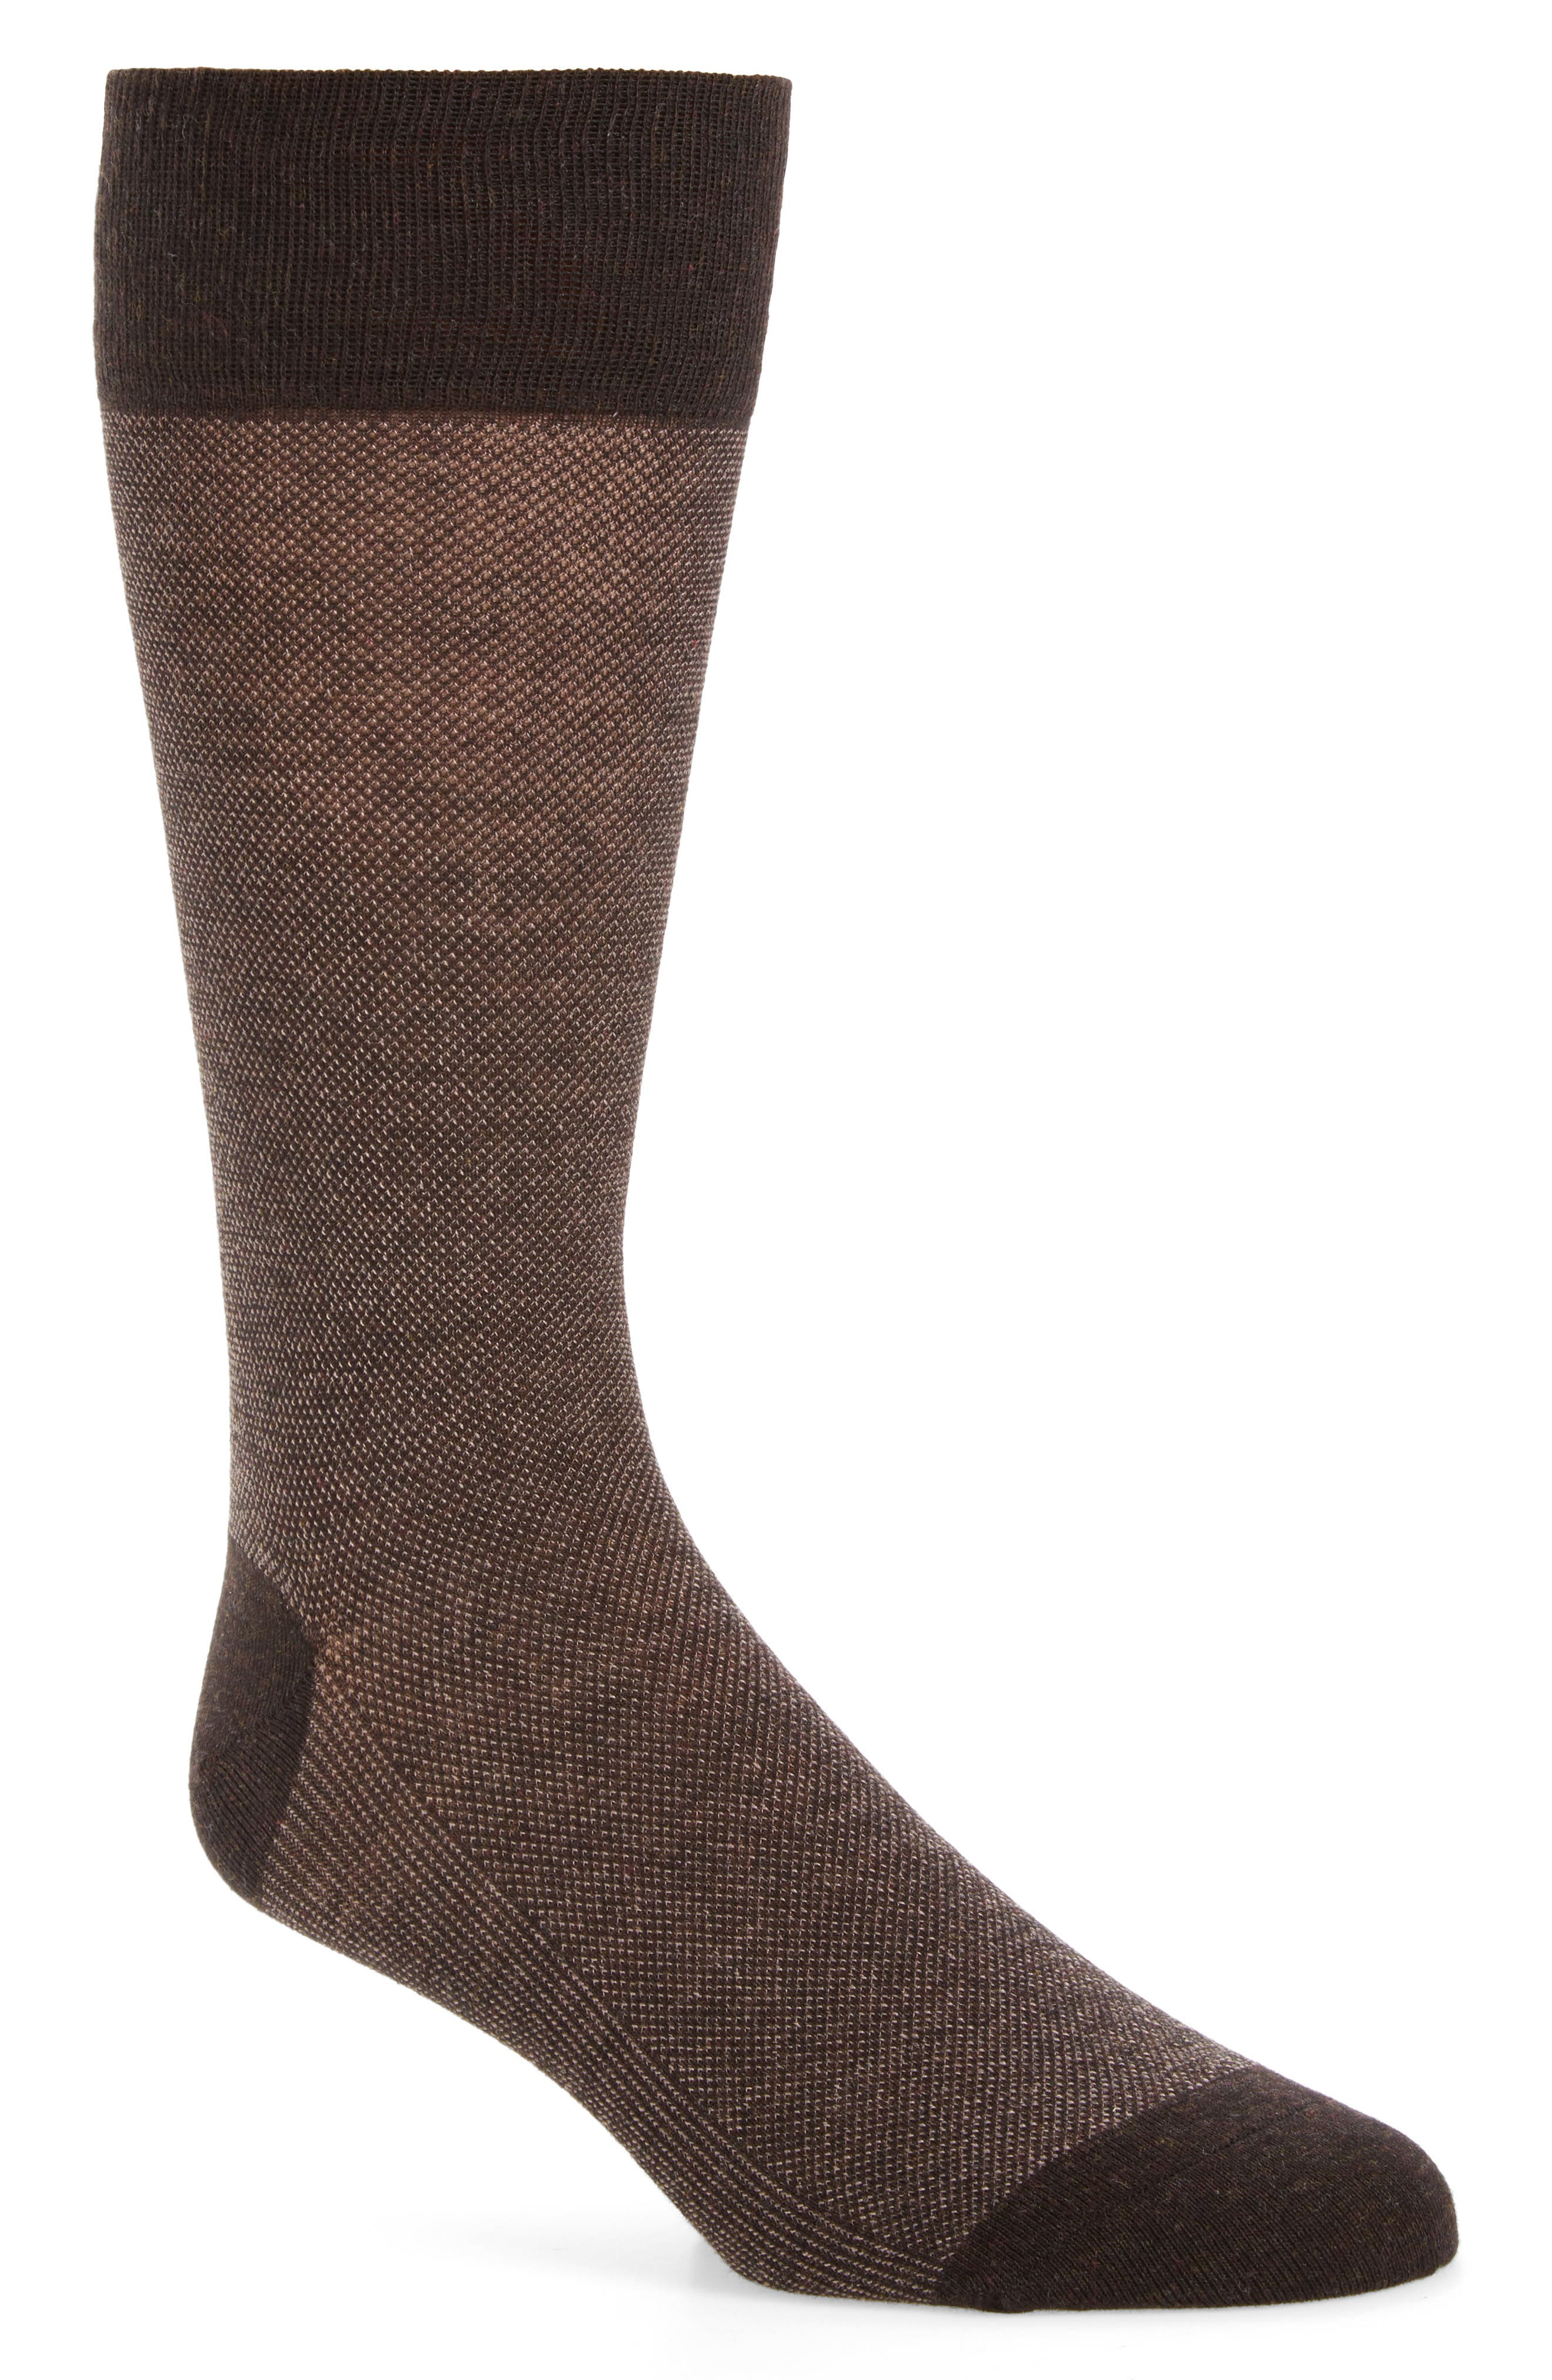 Vintage Men's Socks History-1900 to 1960s Mens Cole Haan Pique Texture Crew Socks Size One Size - Brown $12.50 AT vintagedancer.com